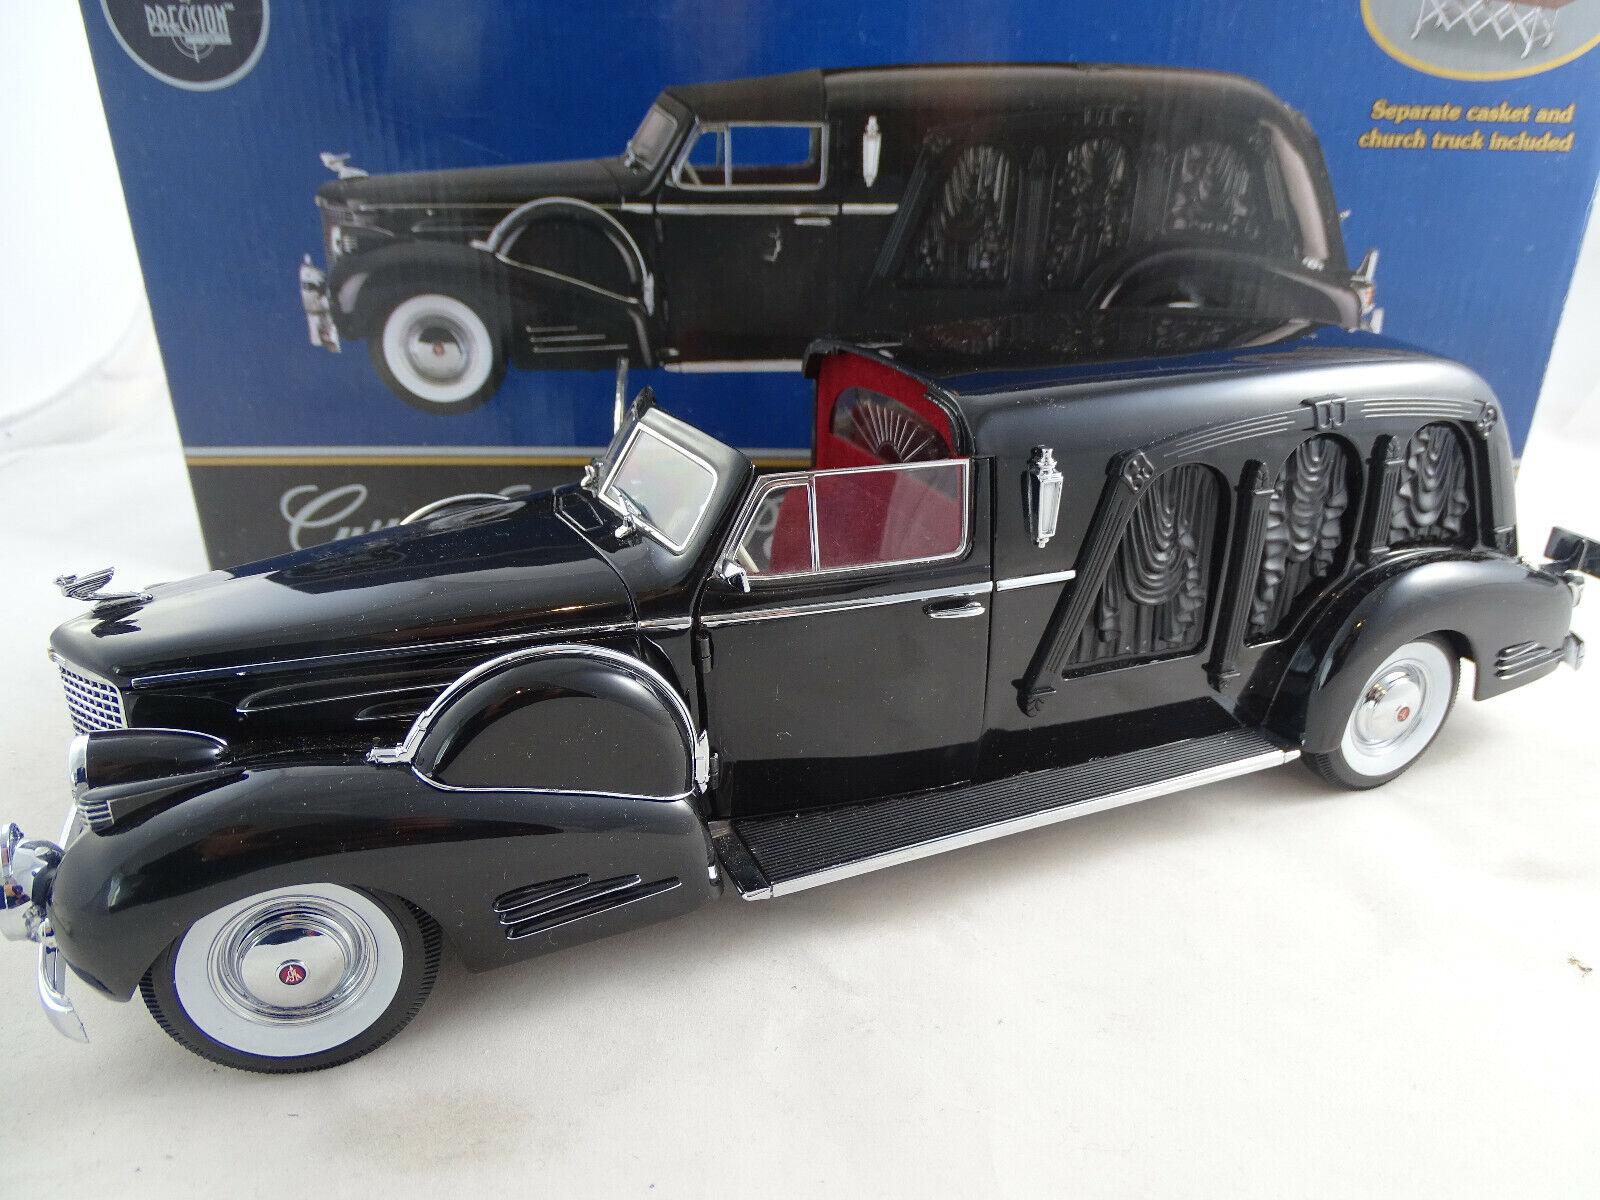 1 18 PrecisionMin. PMSC-05B 1938 Cadillac Town Car Leichenwagen Landau Hearse